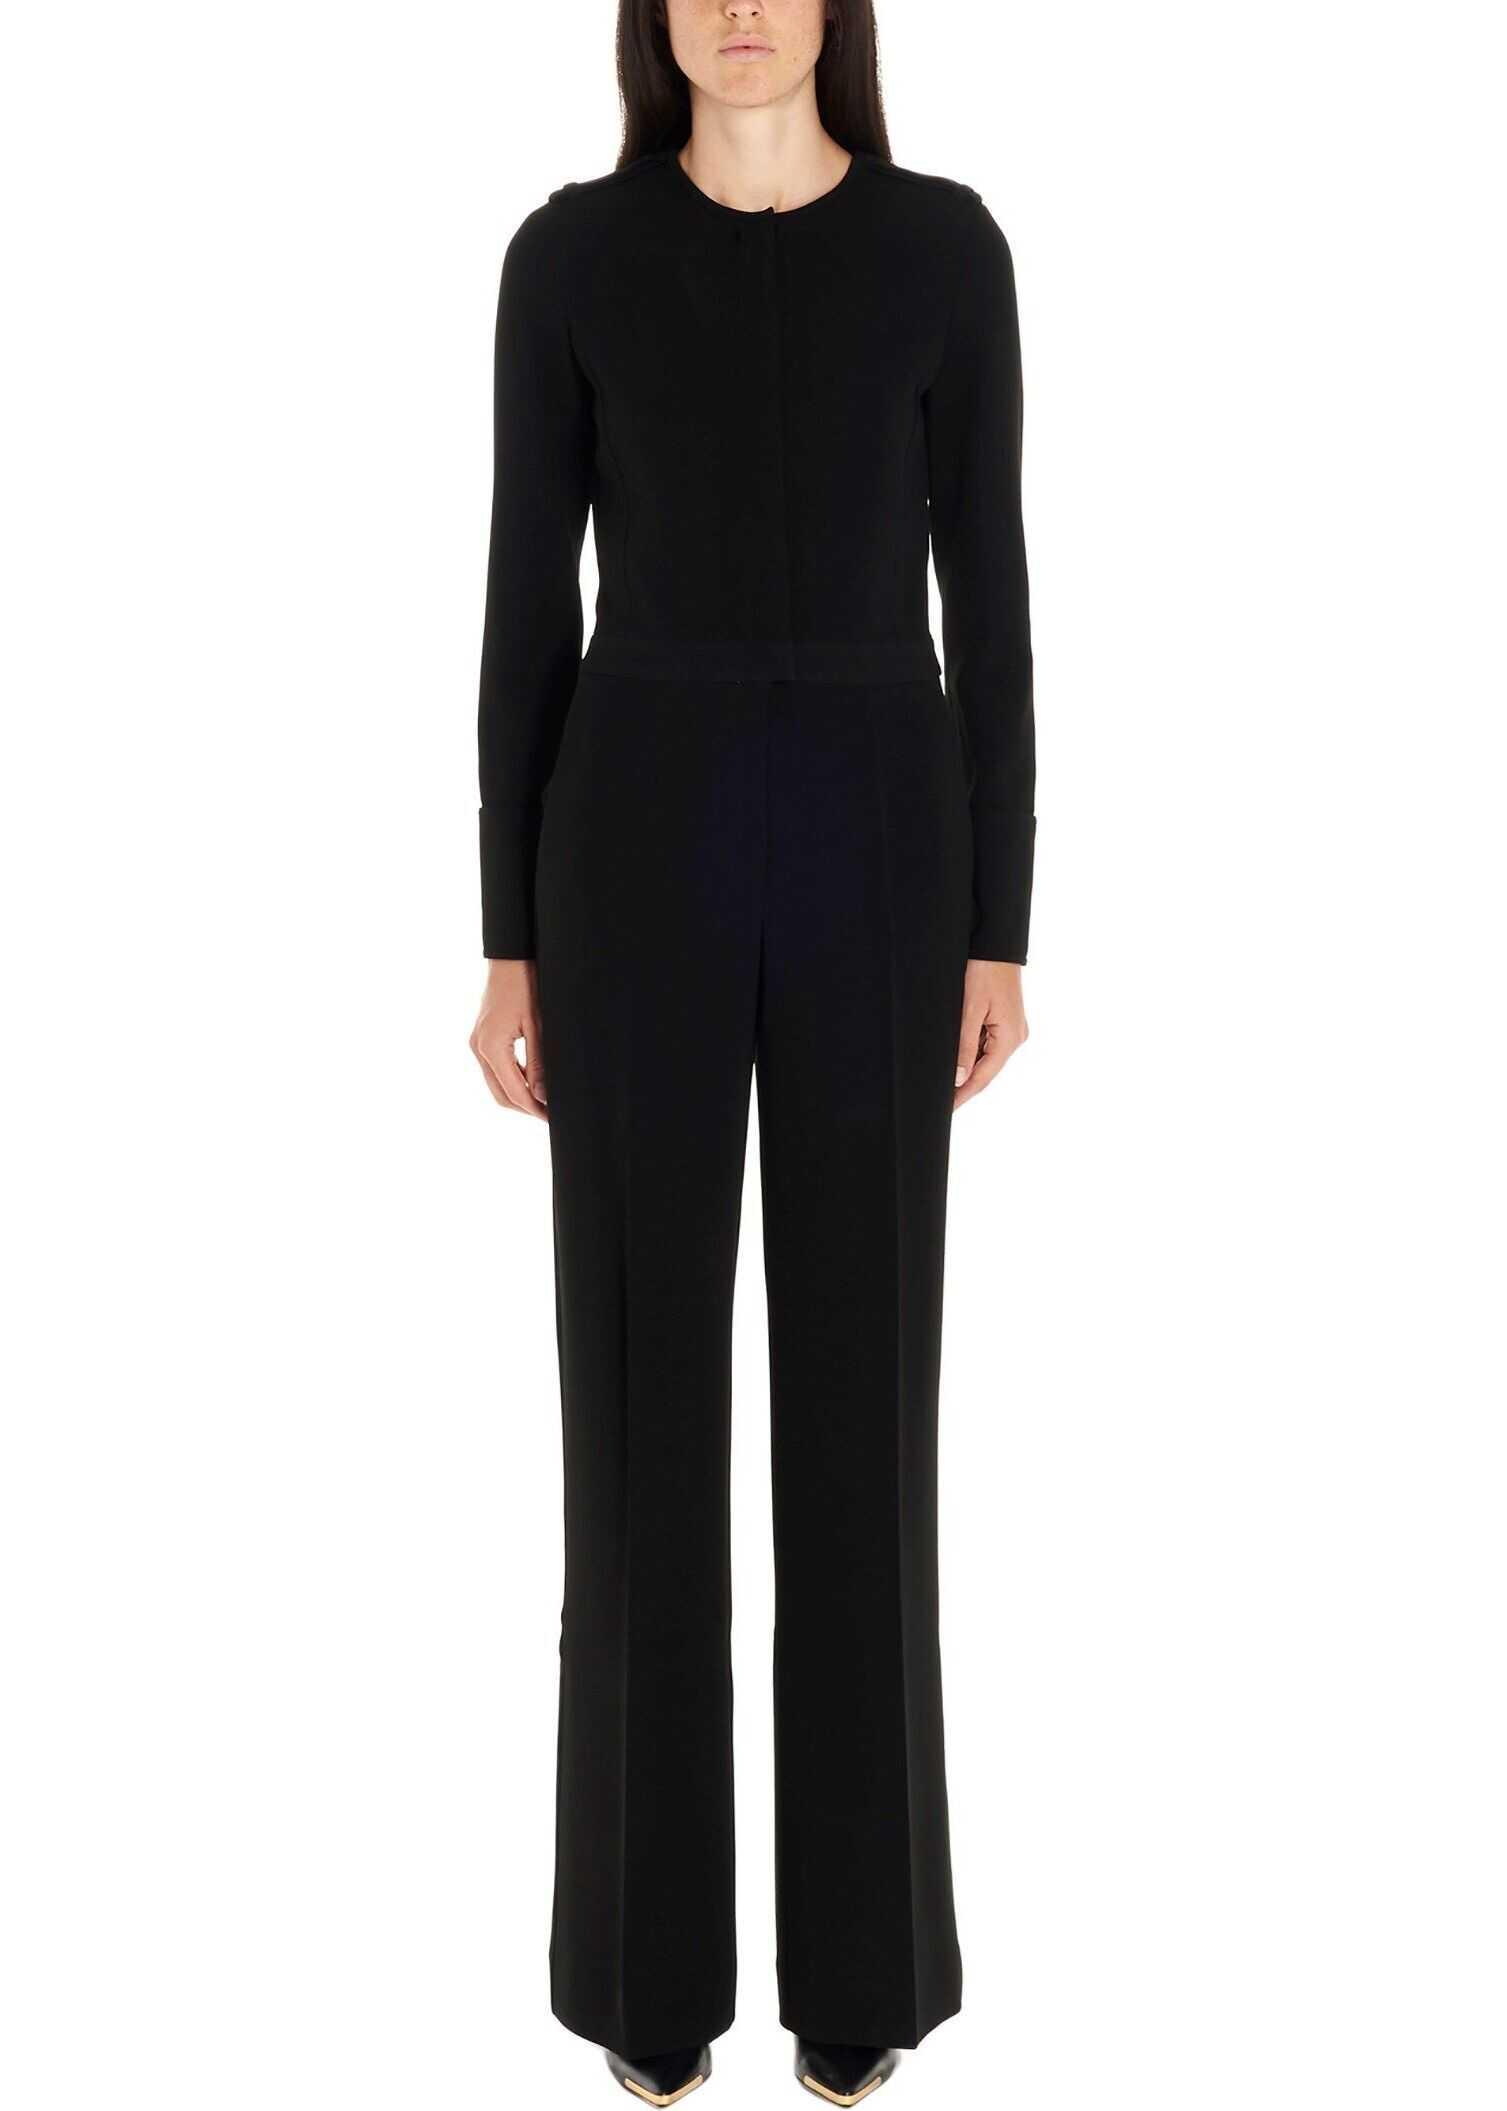 adidas by Stella McCartney Viscose Jumpsuit BLACK